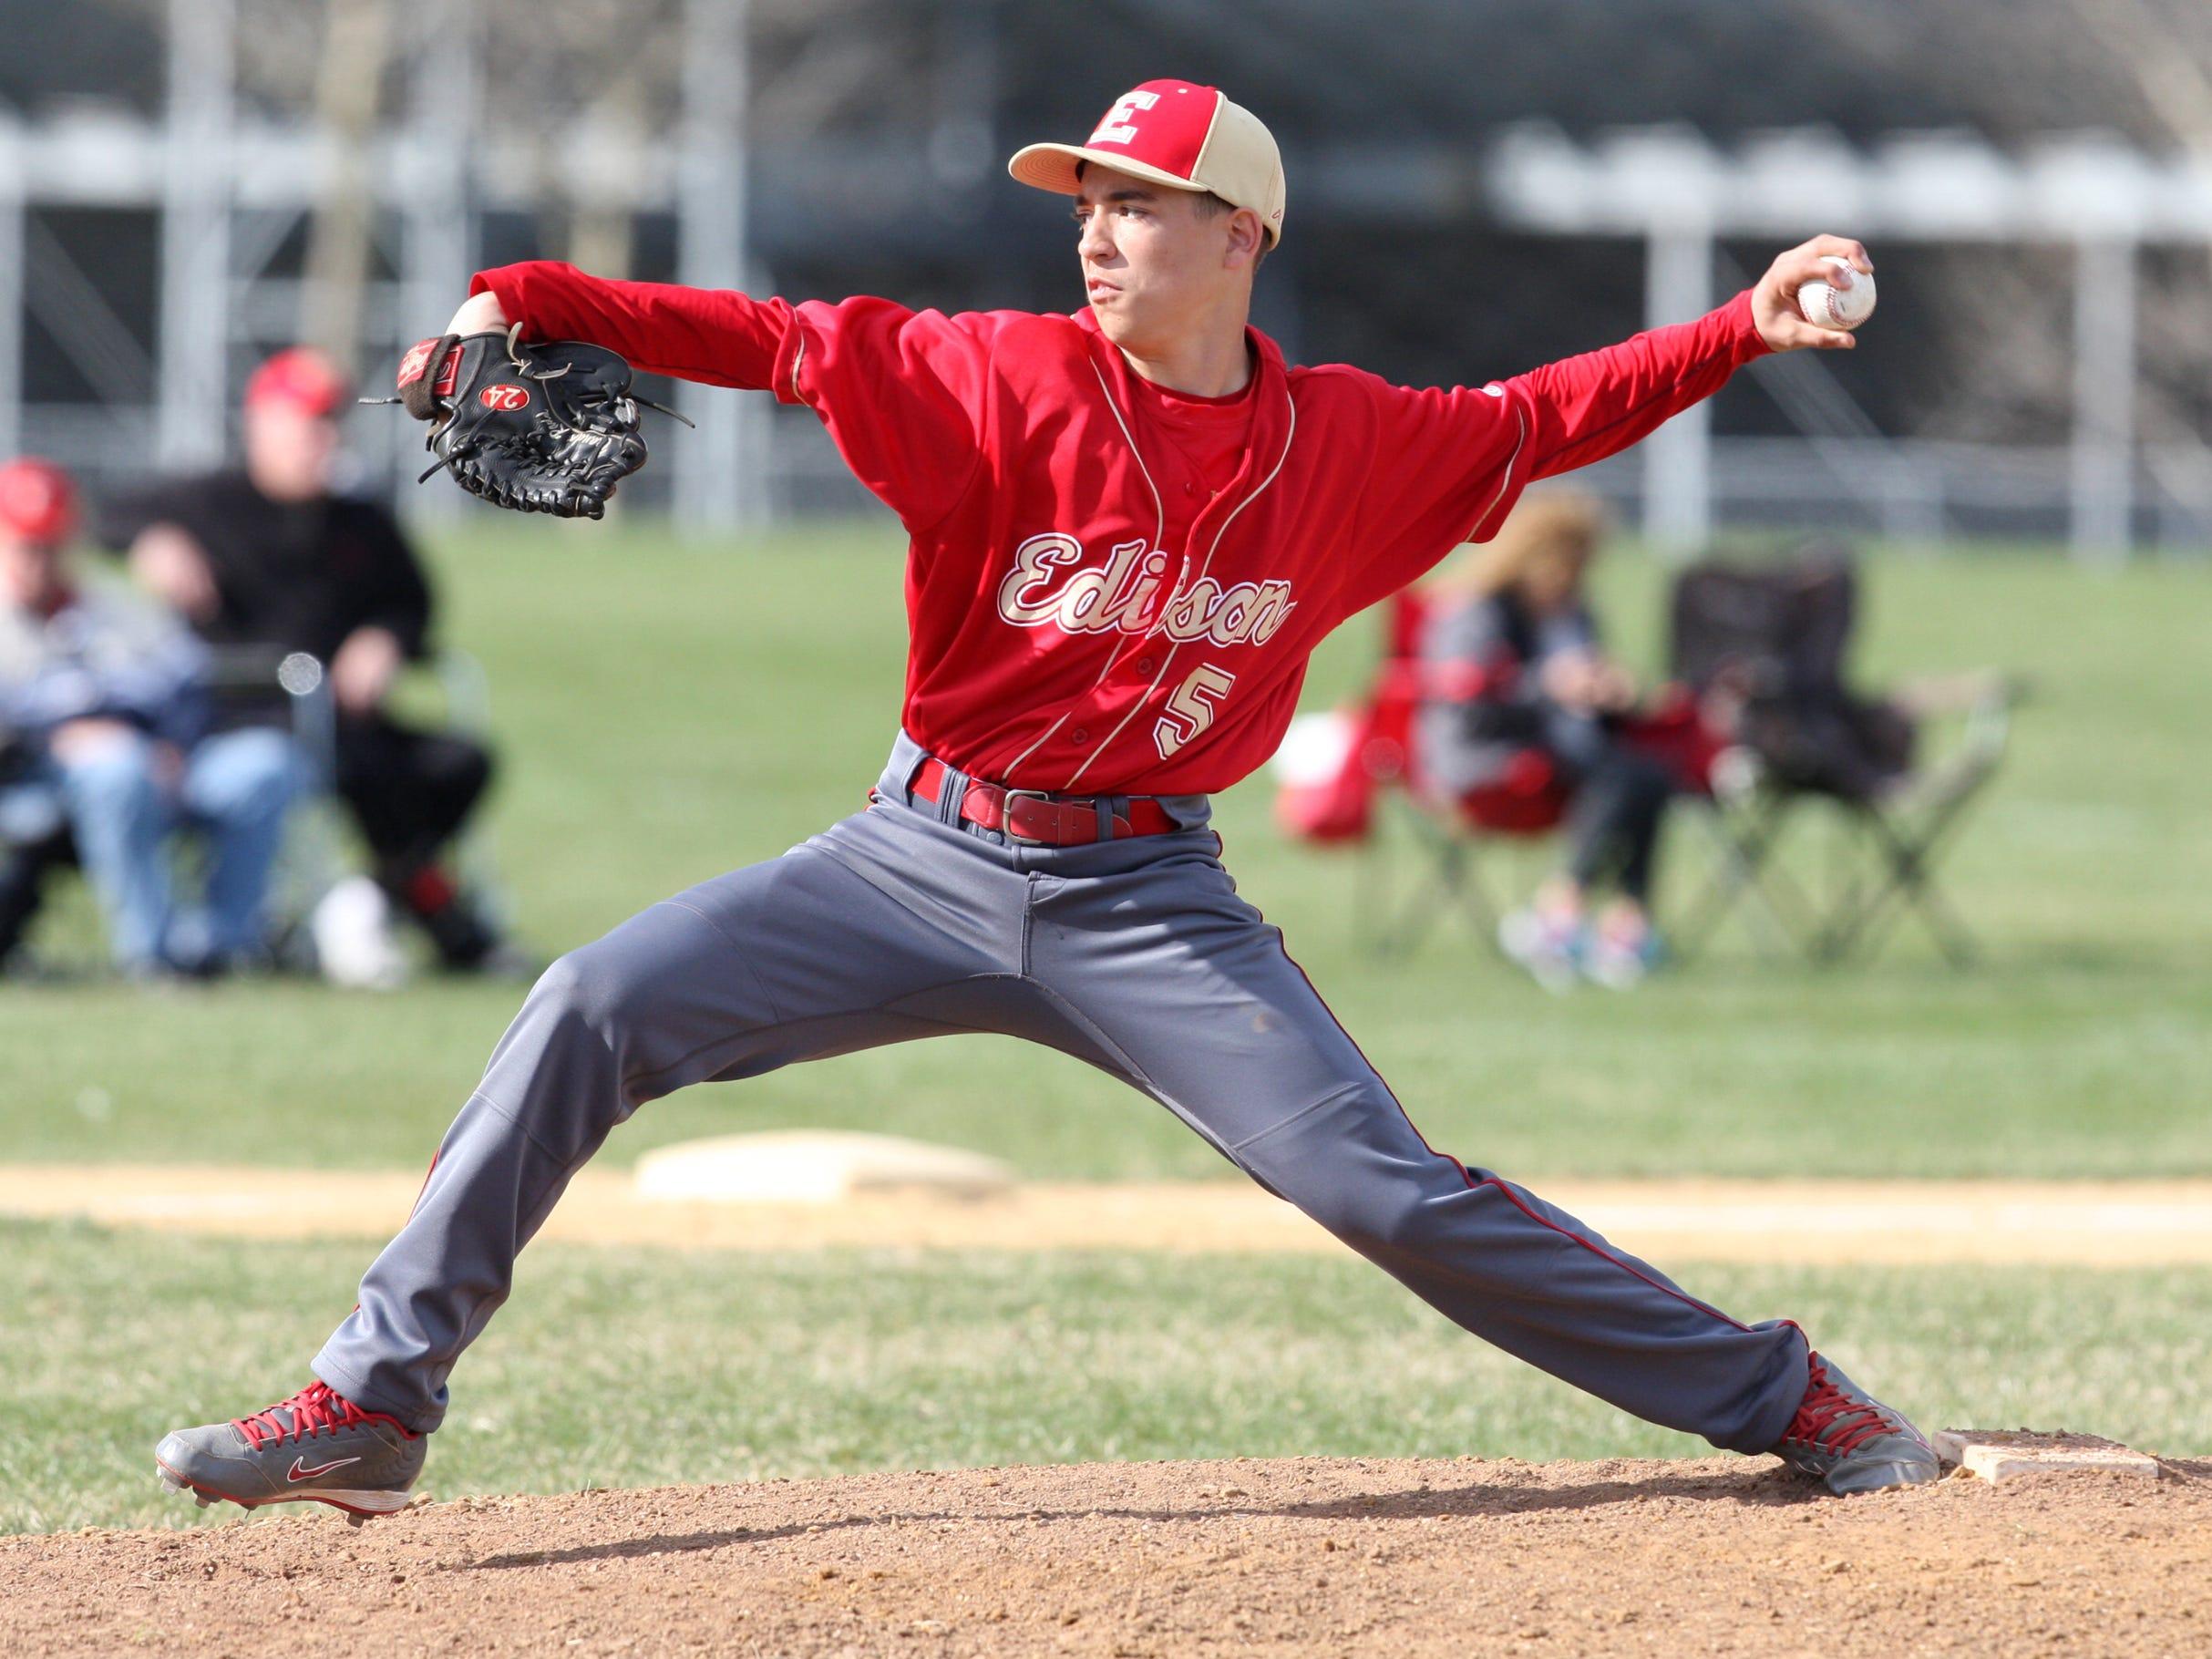 South Brunswick takes on Edison in a boys varsity baseball game at South Brunswick High School Thursday April 16,2015 Edison's # 5 pitcher Brandon Radd on the mound.